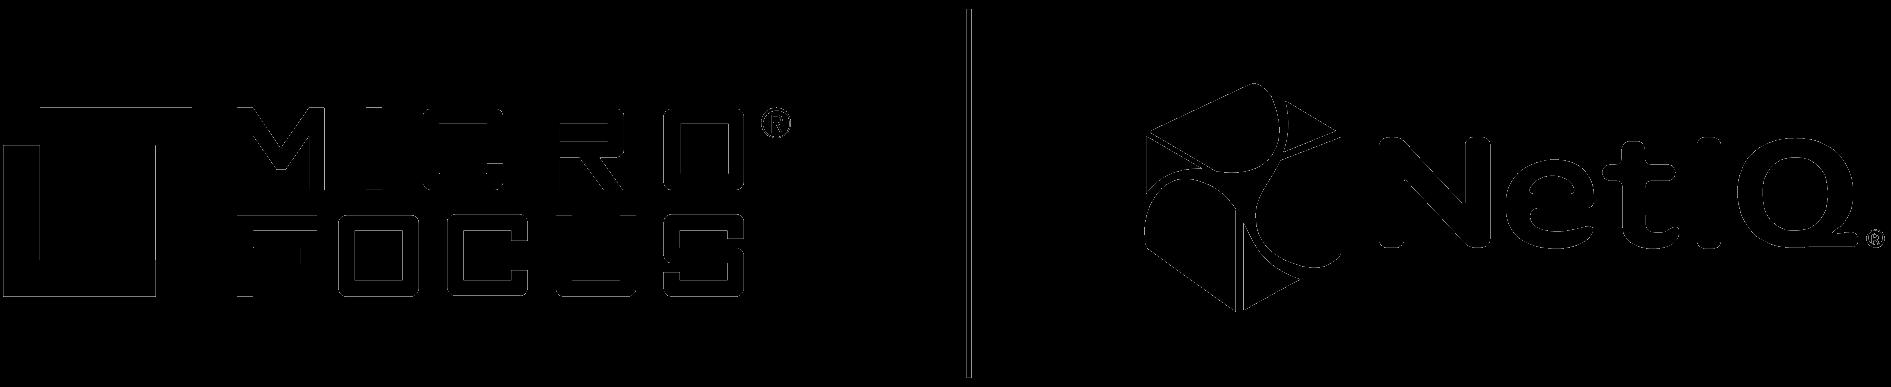 micro-focus-net-iq